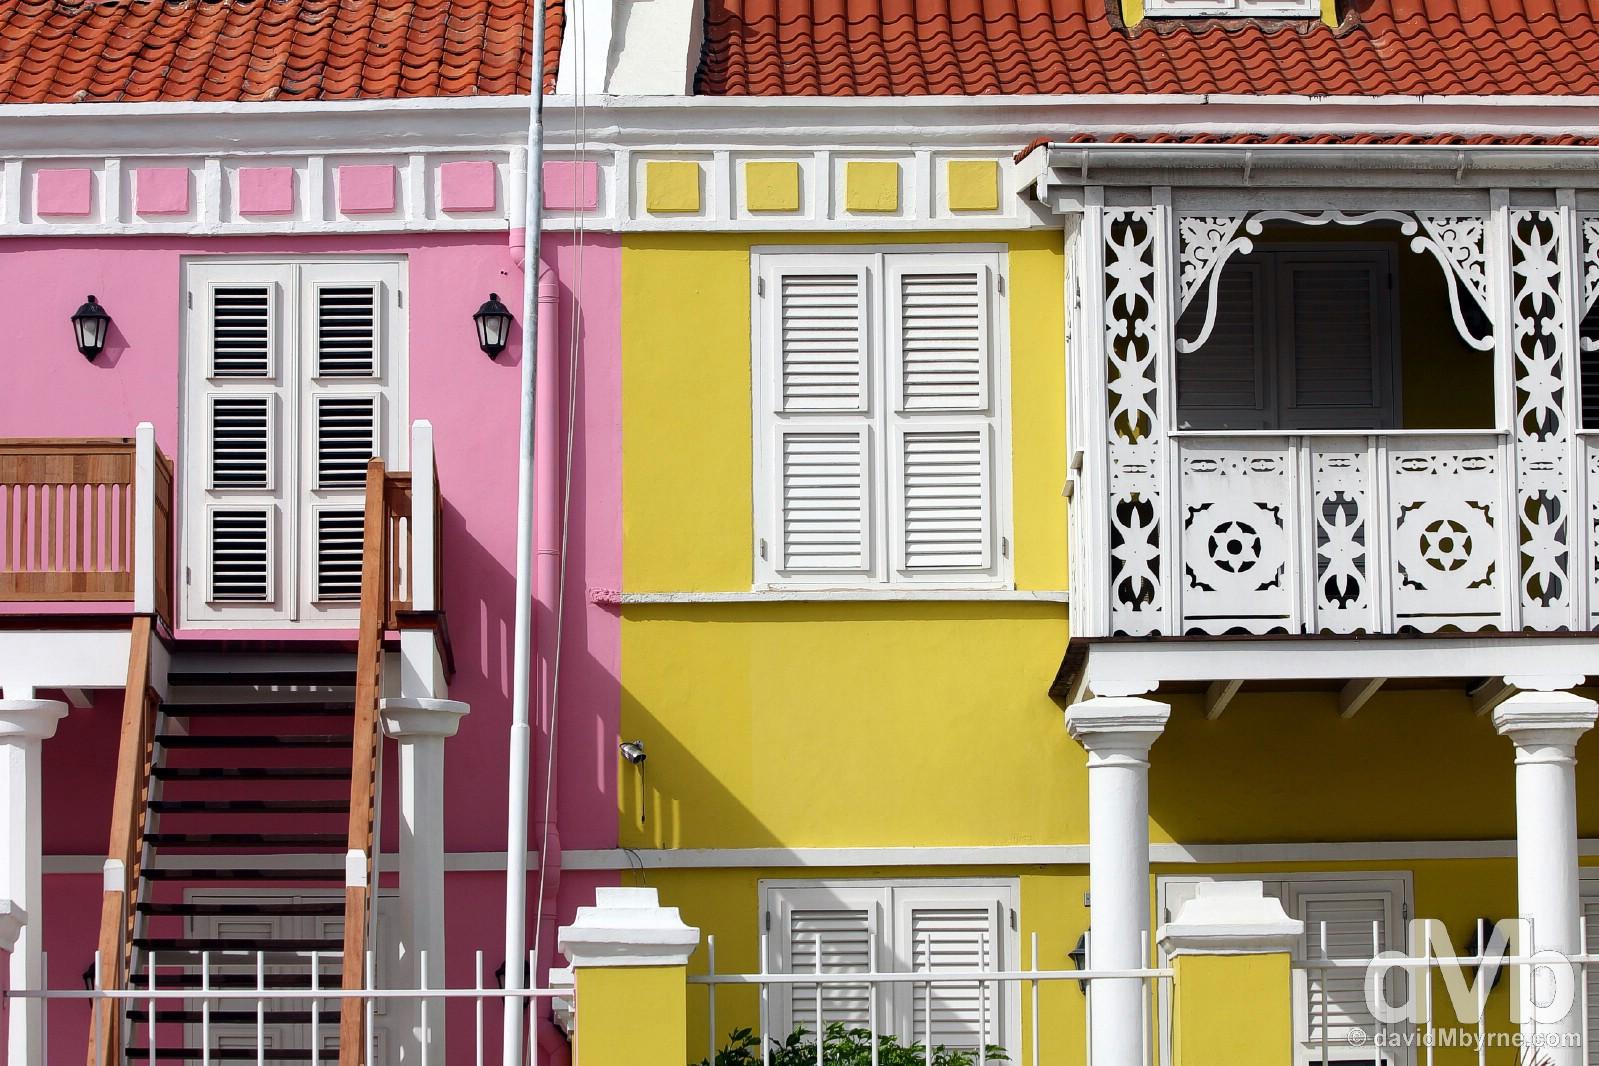 Kaya Wilson Godett, Willemstad, Curacao, Lesser Antilles. June 20, 2015.